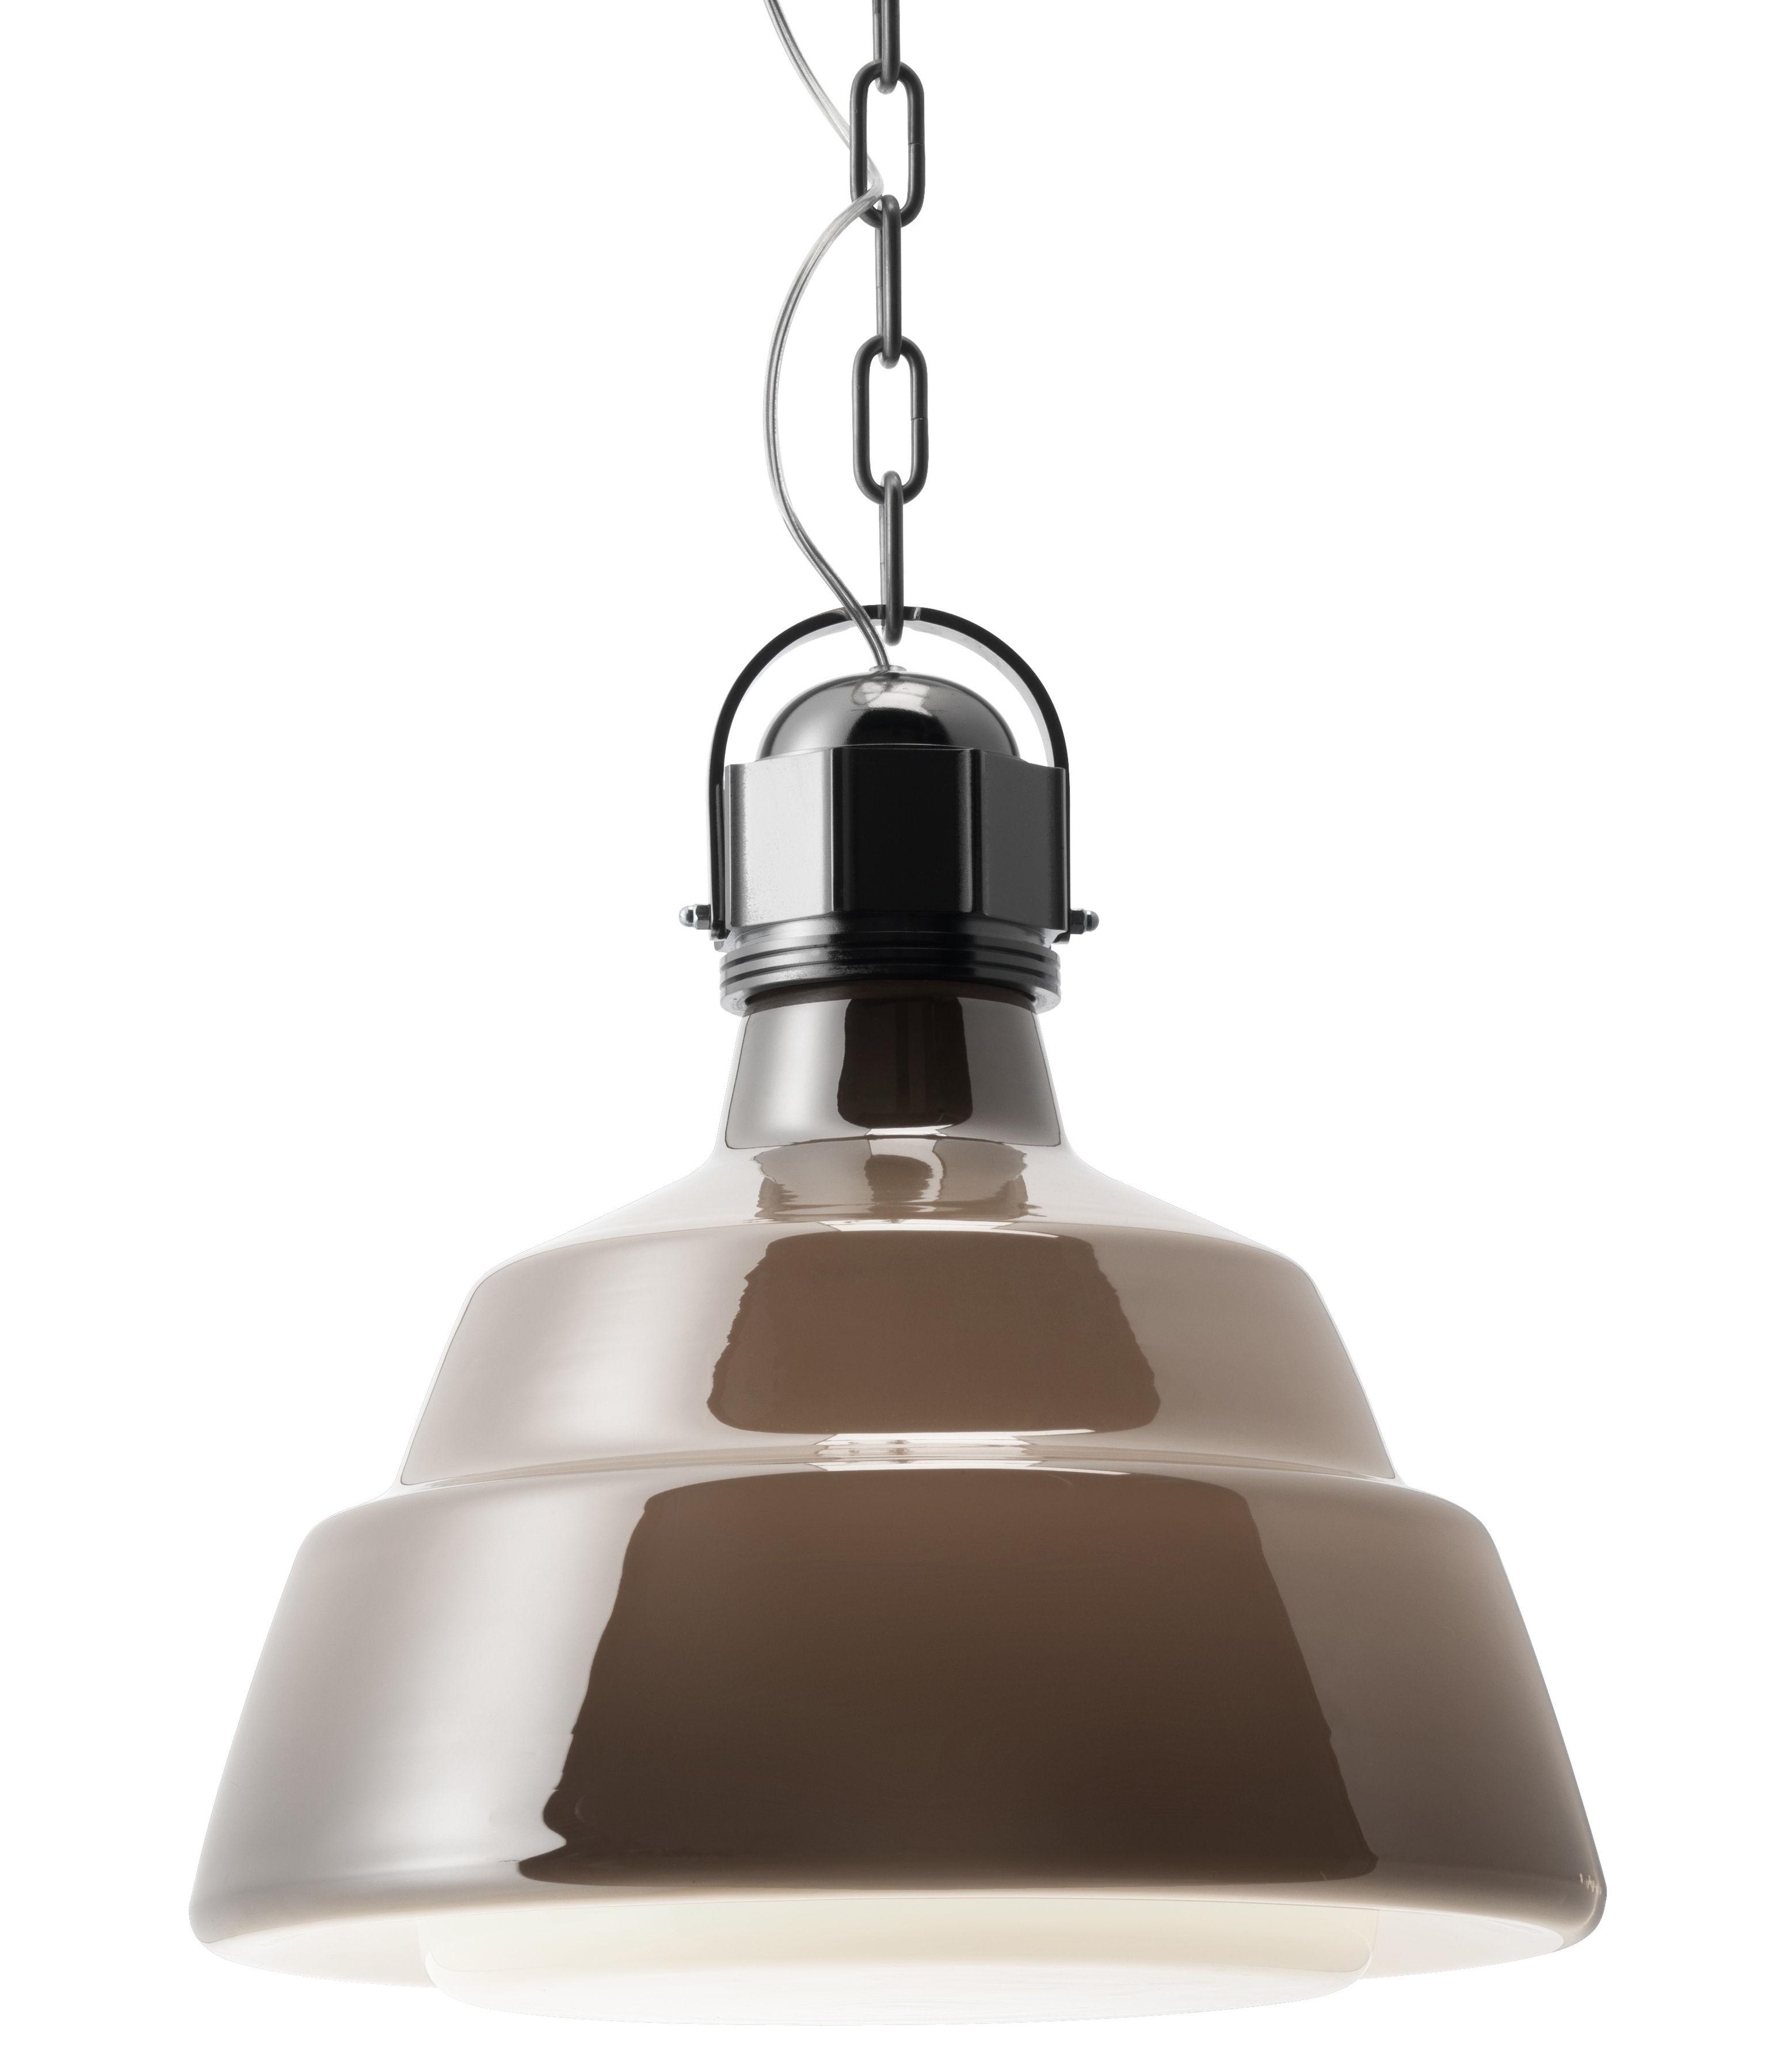 Lighting - Pendant Lighting - Glas Pendant - Ø 41 cm by Diesel with Foscarini - Ø 41 cm - Chromed / brown - Blown glass, Chromed metal